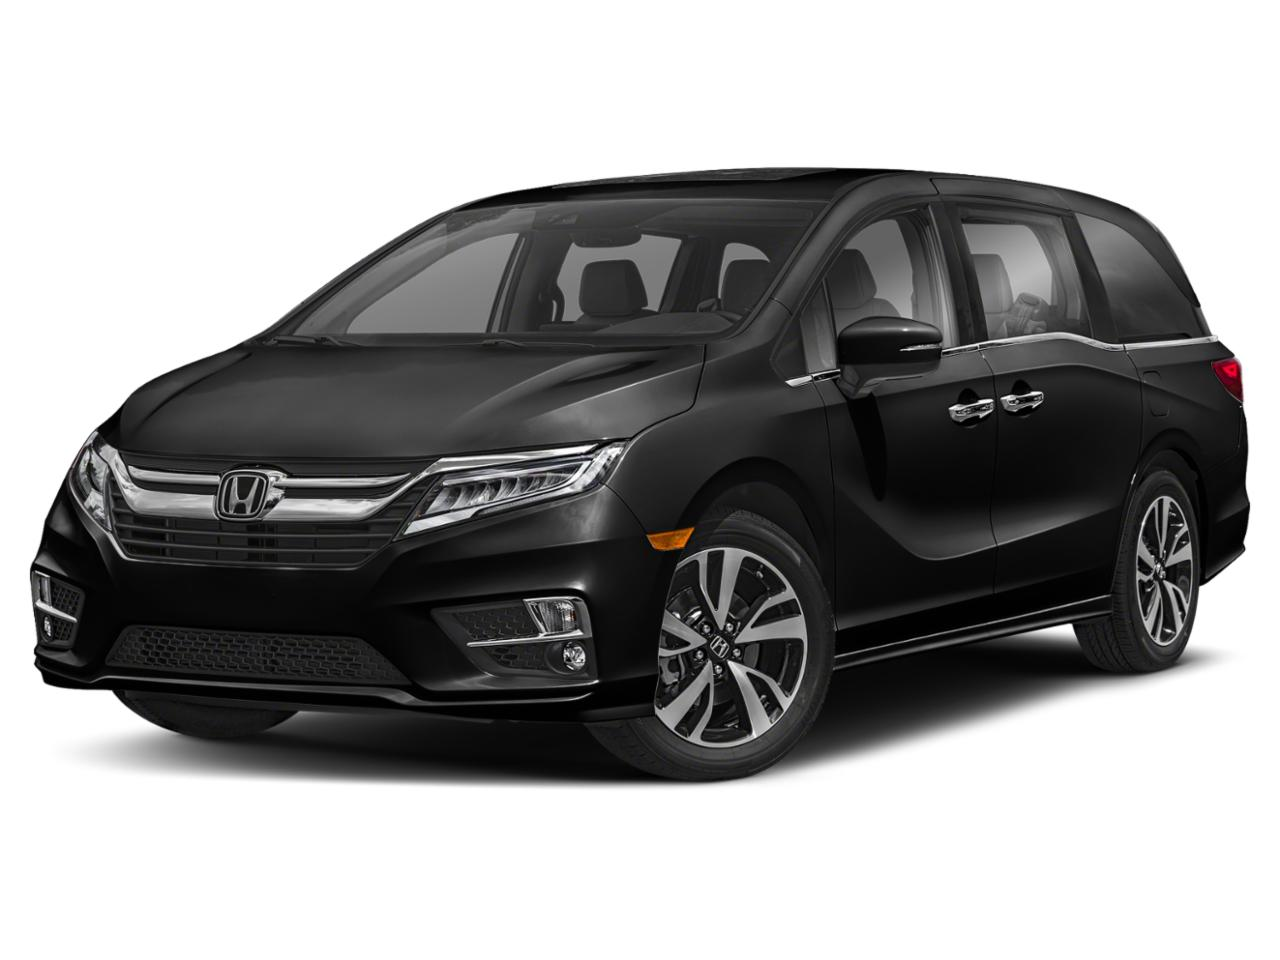 2020 Honda Odyssey Vehicle Photo in Owensboro, KY 42302